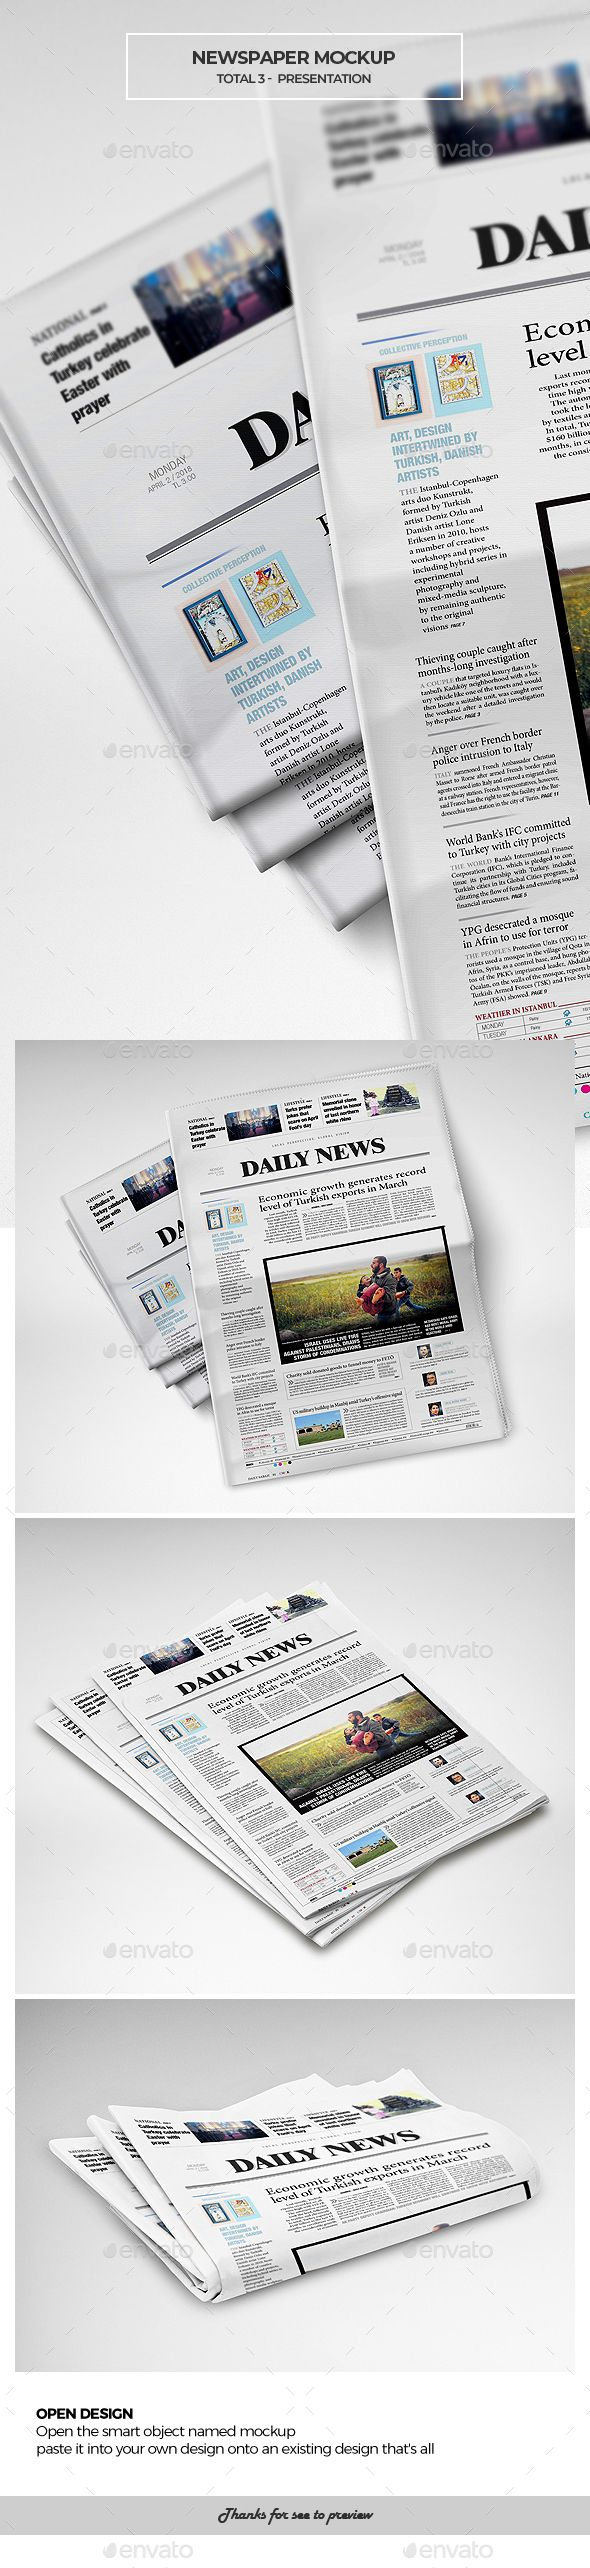 Download Newspaper Mockup Mockup Graphic Design Templates Print Mockup